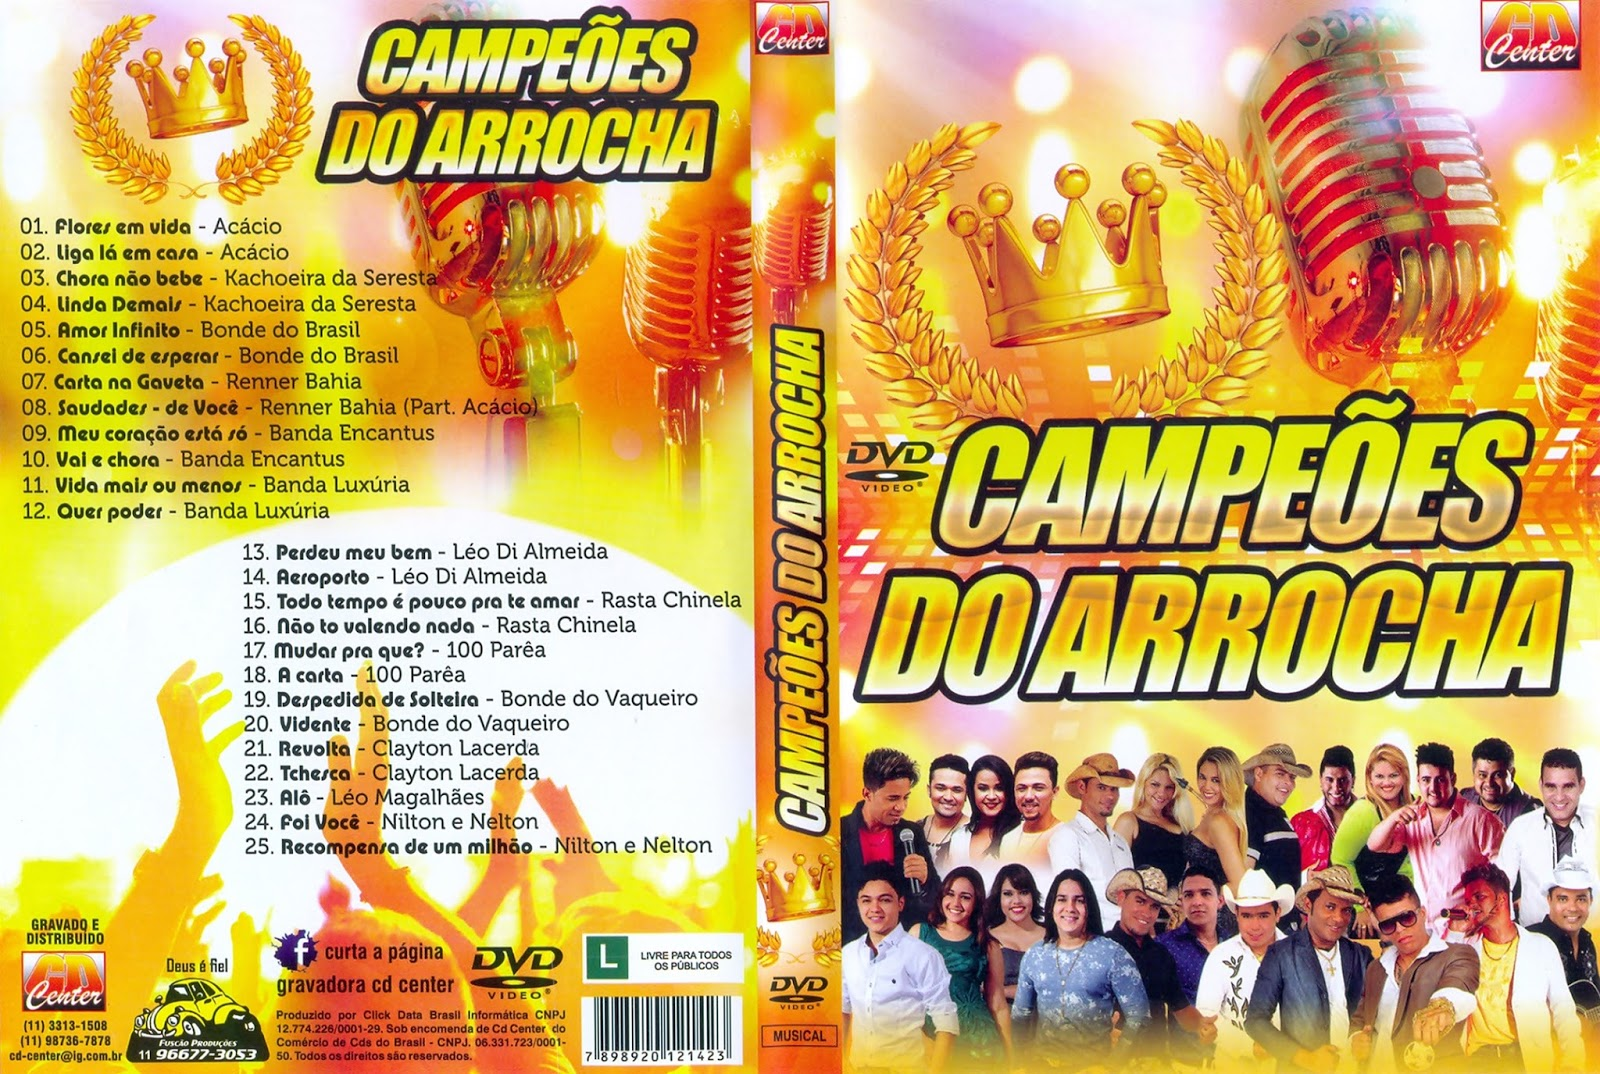 Campeões Do Arrocha DVDRip + DVD-R Campe 25C3 25B5es 2BDo 2BArrocha 2BDVD R 2BXANDAO 2BDOWNLOAD